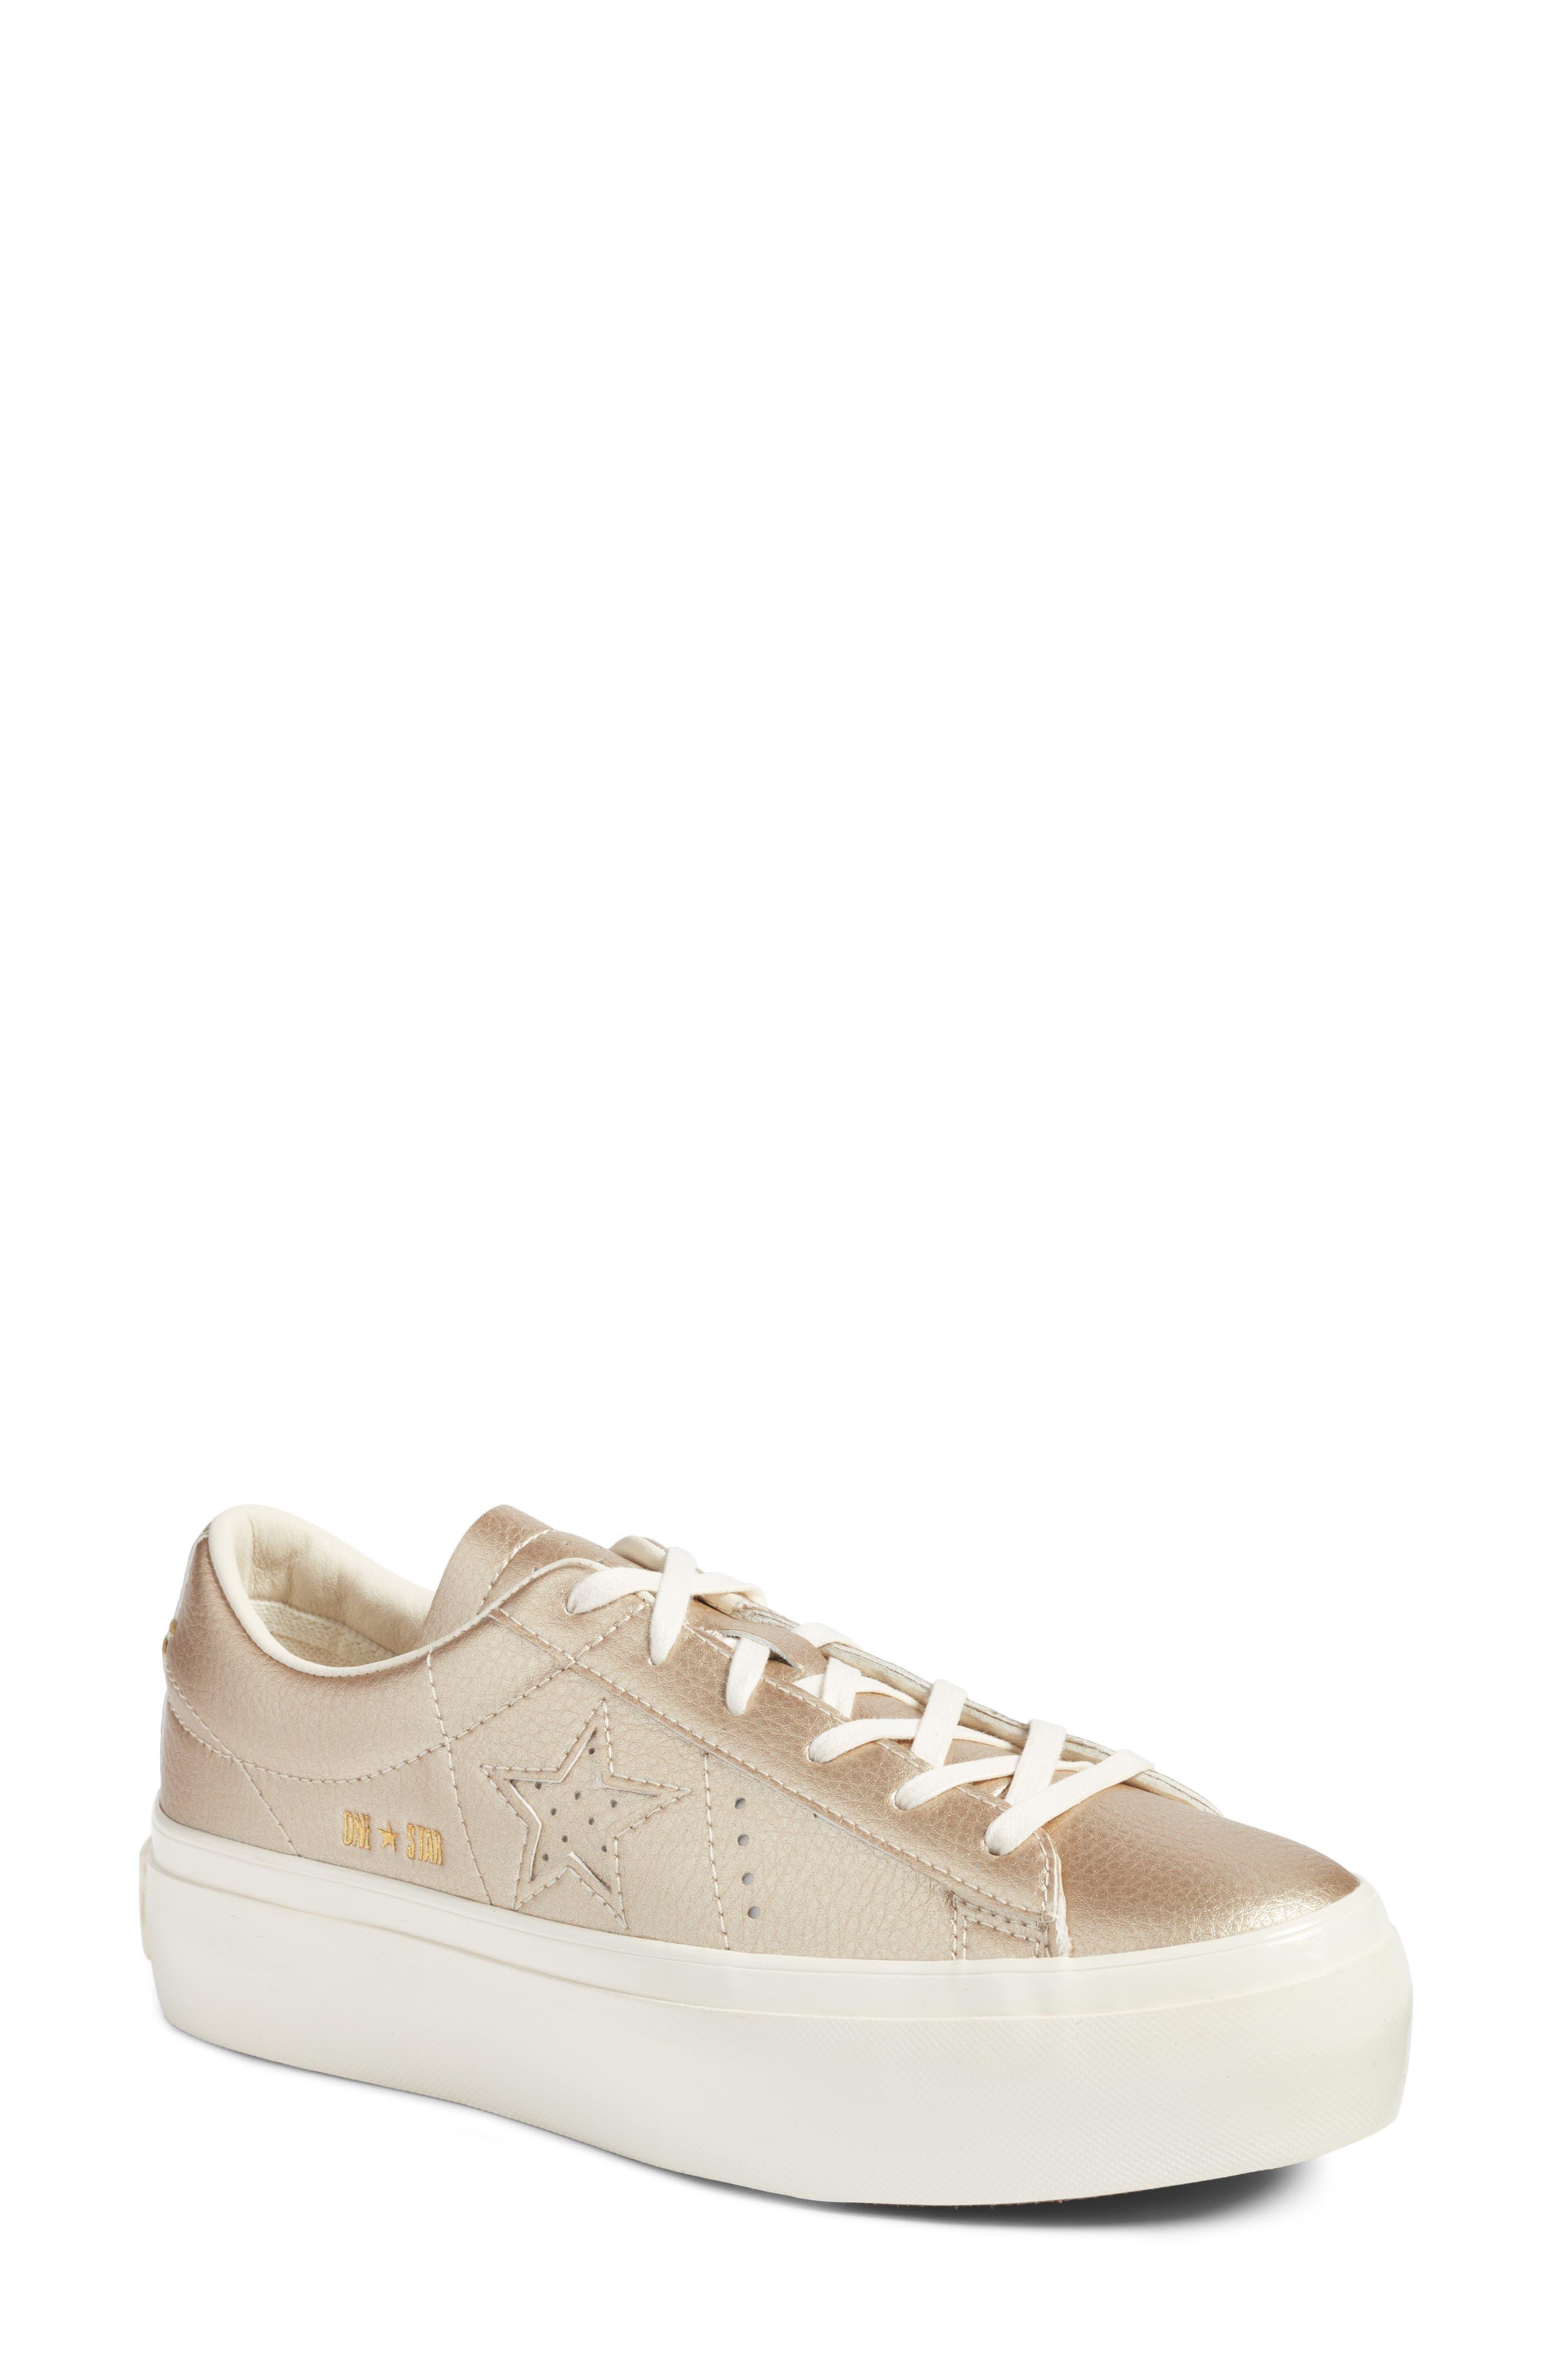 Alternate Image 1 Selected - Converse Chuck Taylor® All Star® One Star Metallic Platform Sneaker (Women)